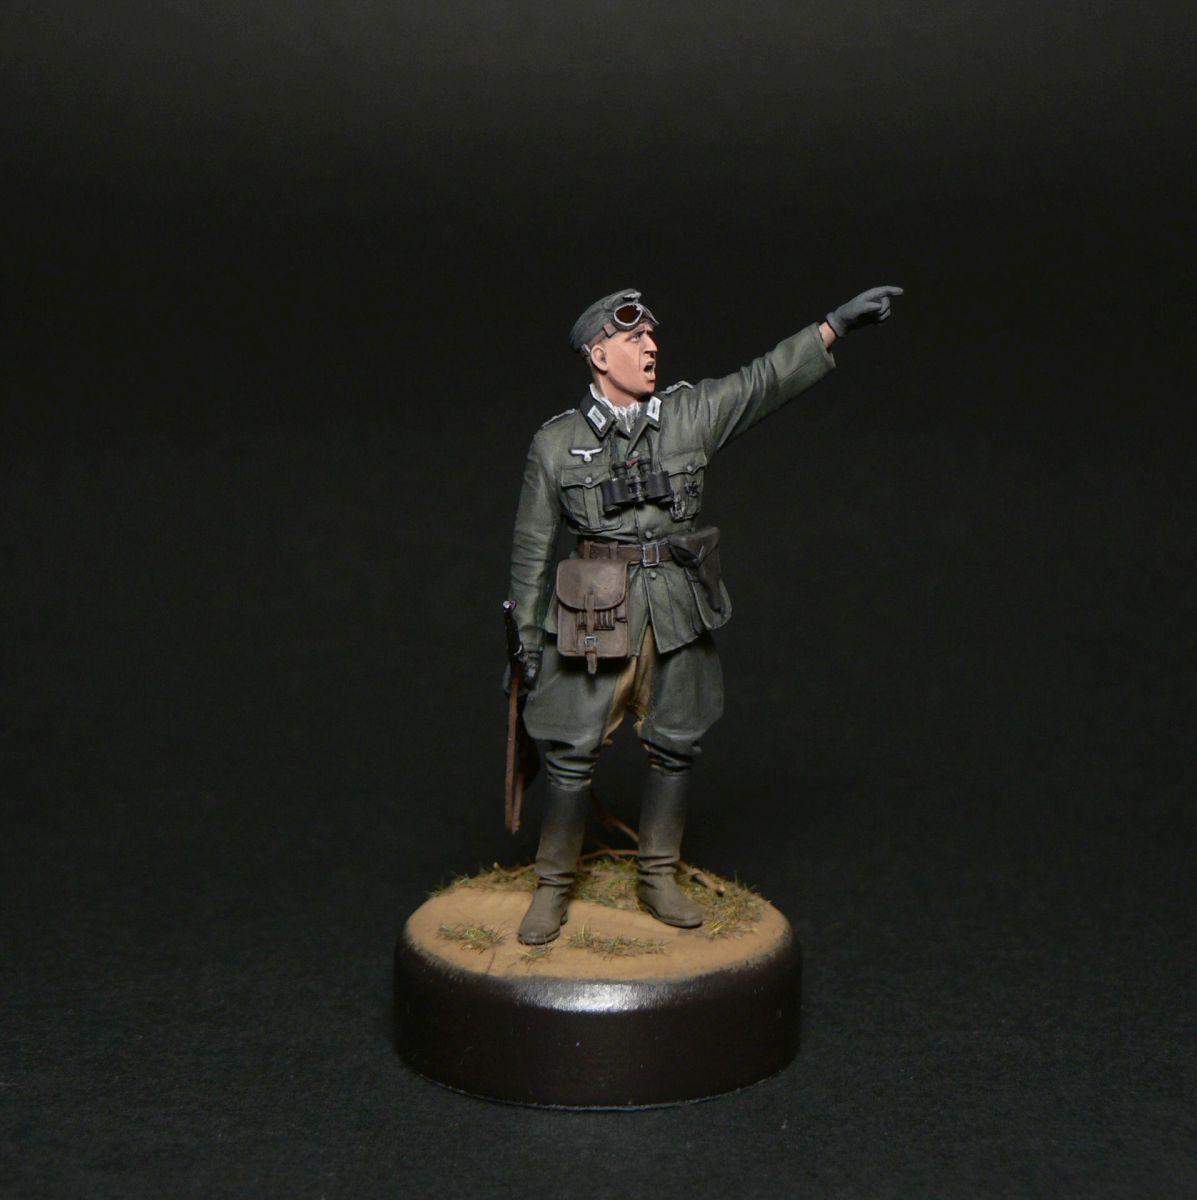 Figures: Oberleutnant, photo #5